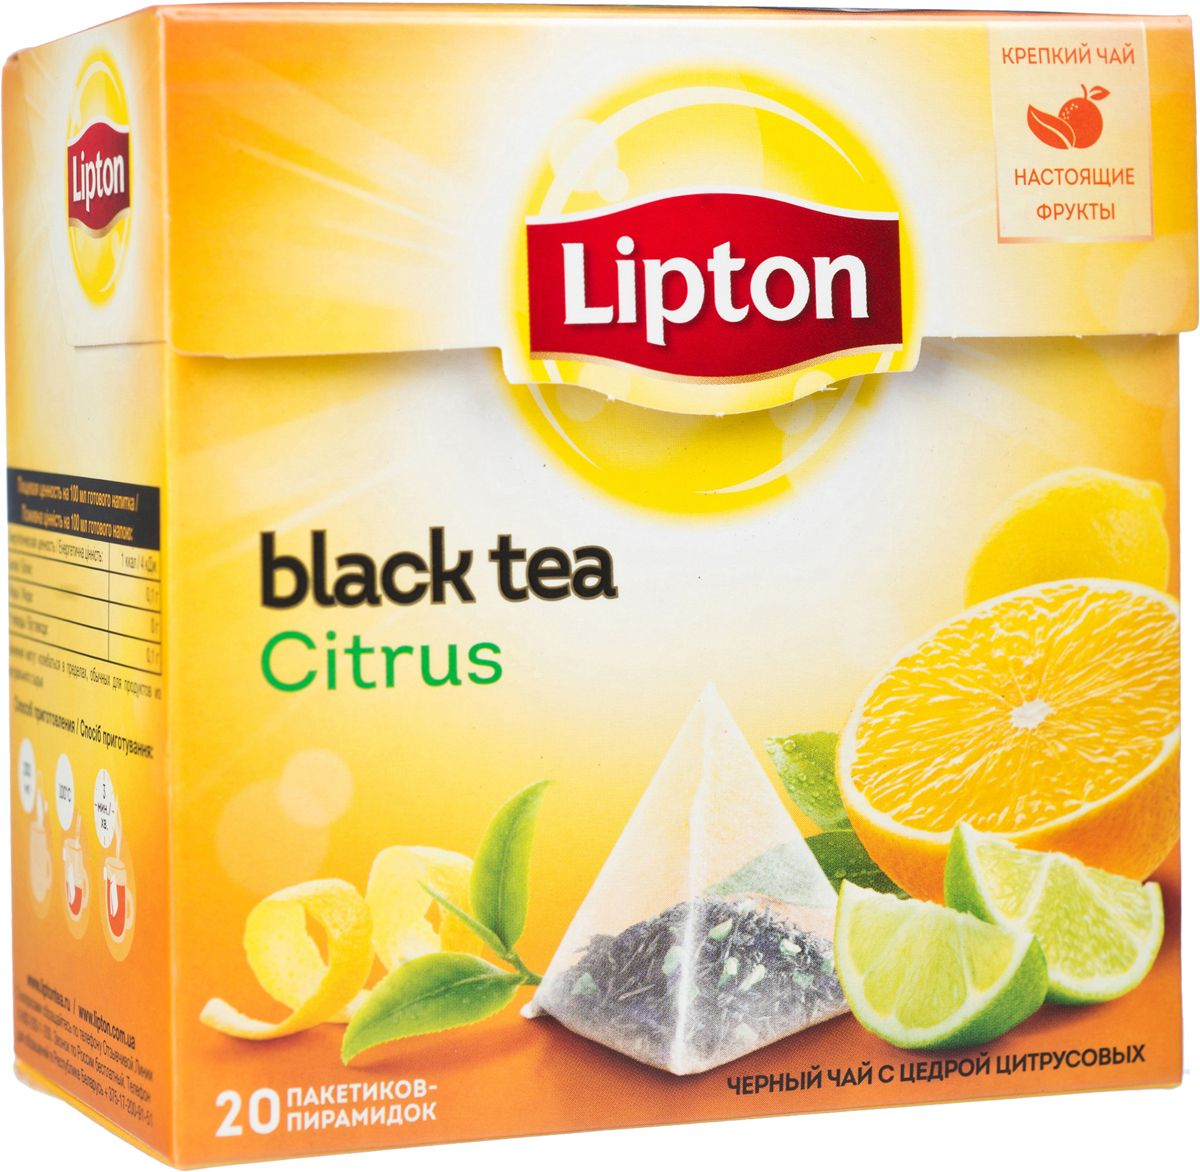 Lipton Черный чай Citrus Tea 20 шт saleem ashraf communication gap regarding citrus production in punjab pakistan